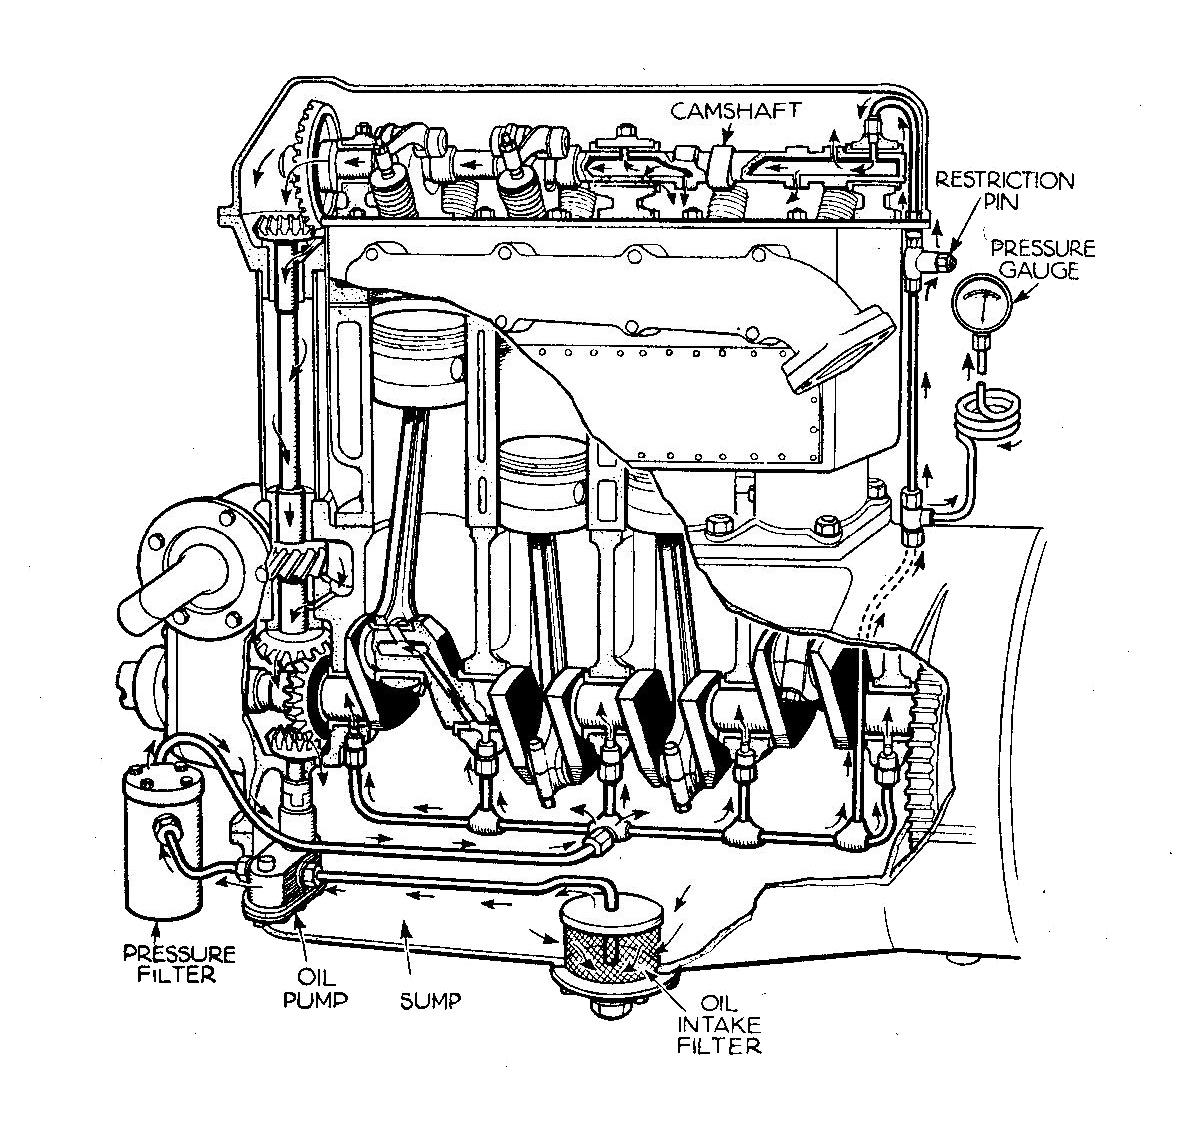 chevy 4 3 engine diagram dg 4177  chevy 4 3 v6 engine oil system diagram free diagram  chevy 4 3 v6 engine oil system diagram